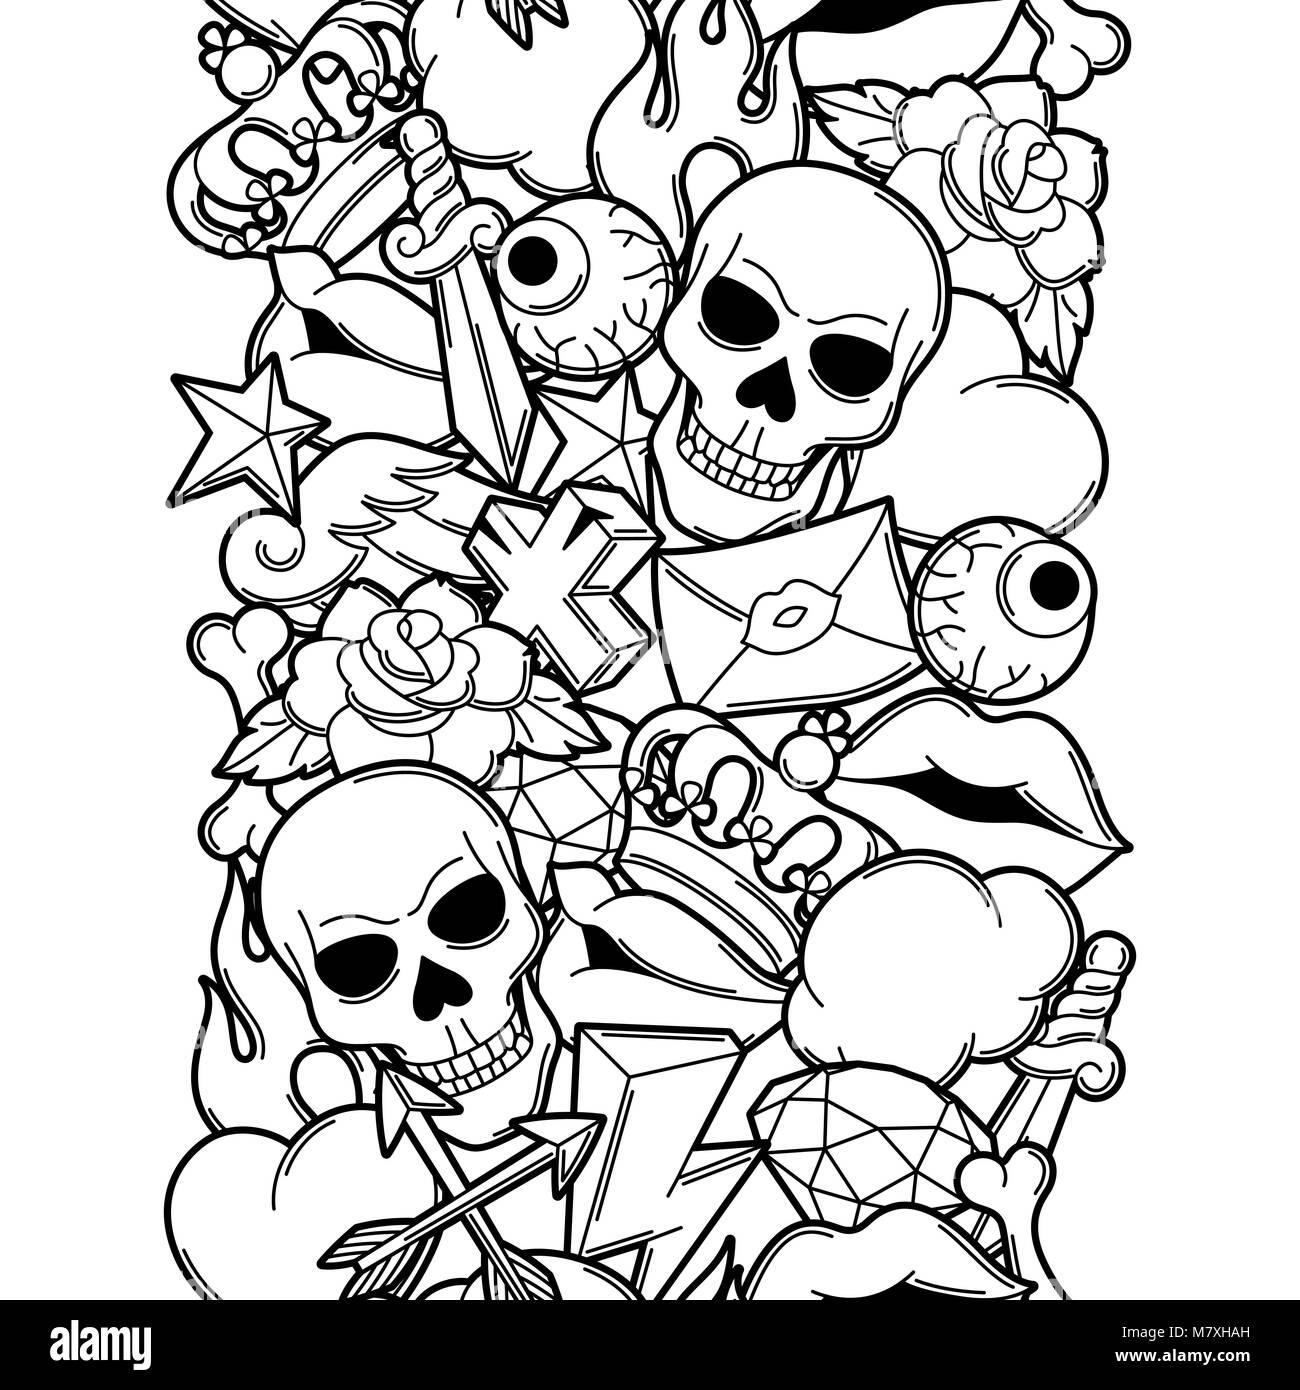 f6c6319d7 Seamless pattern with retro tattoo symbols. Cartoon old school illustration